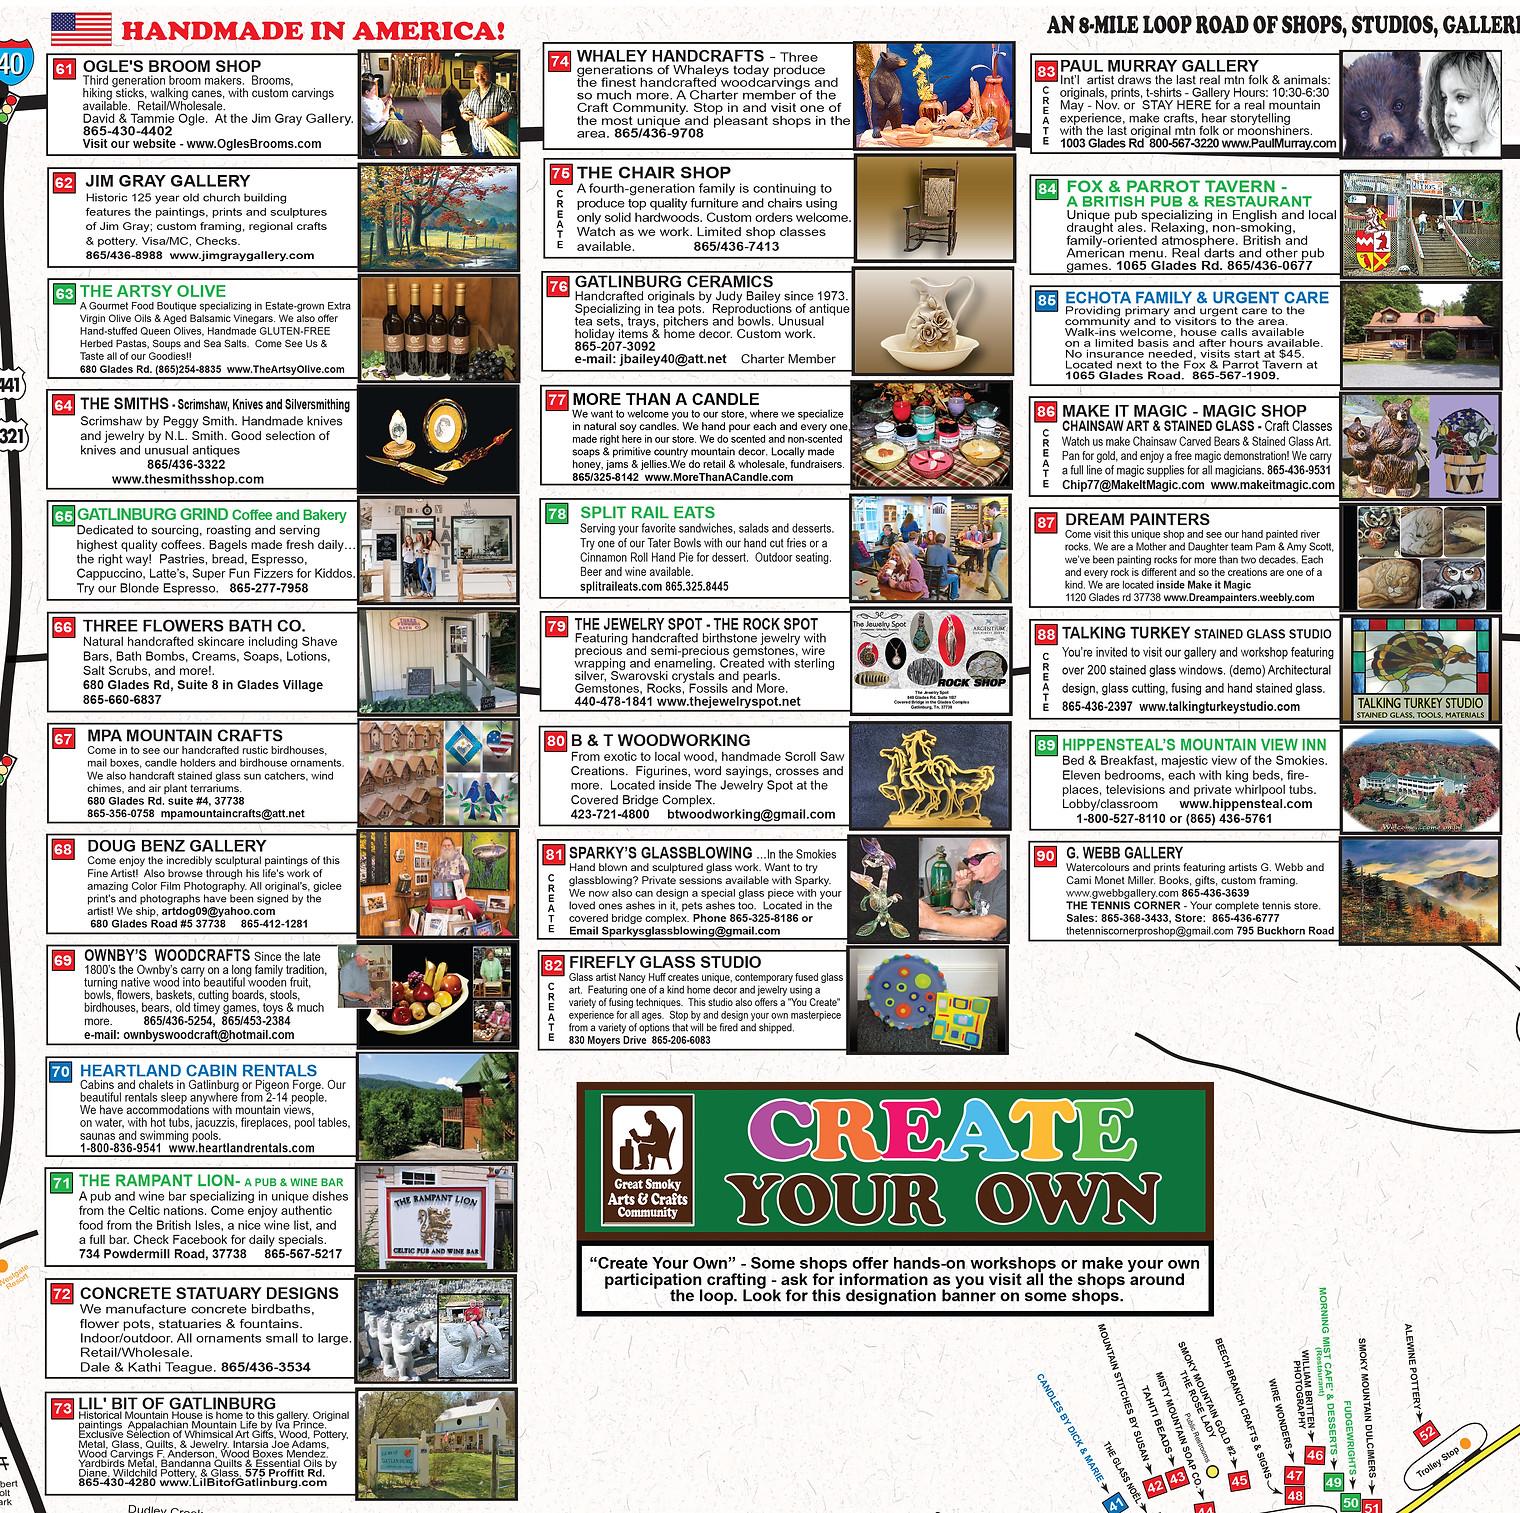 acc brochure FRONT 2020-21 WEB BROCH4.jp